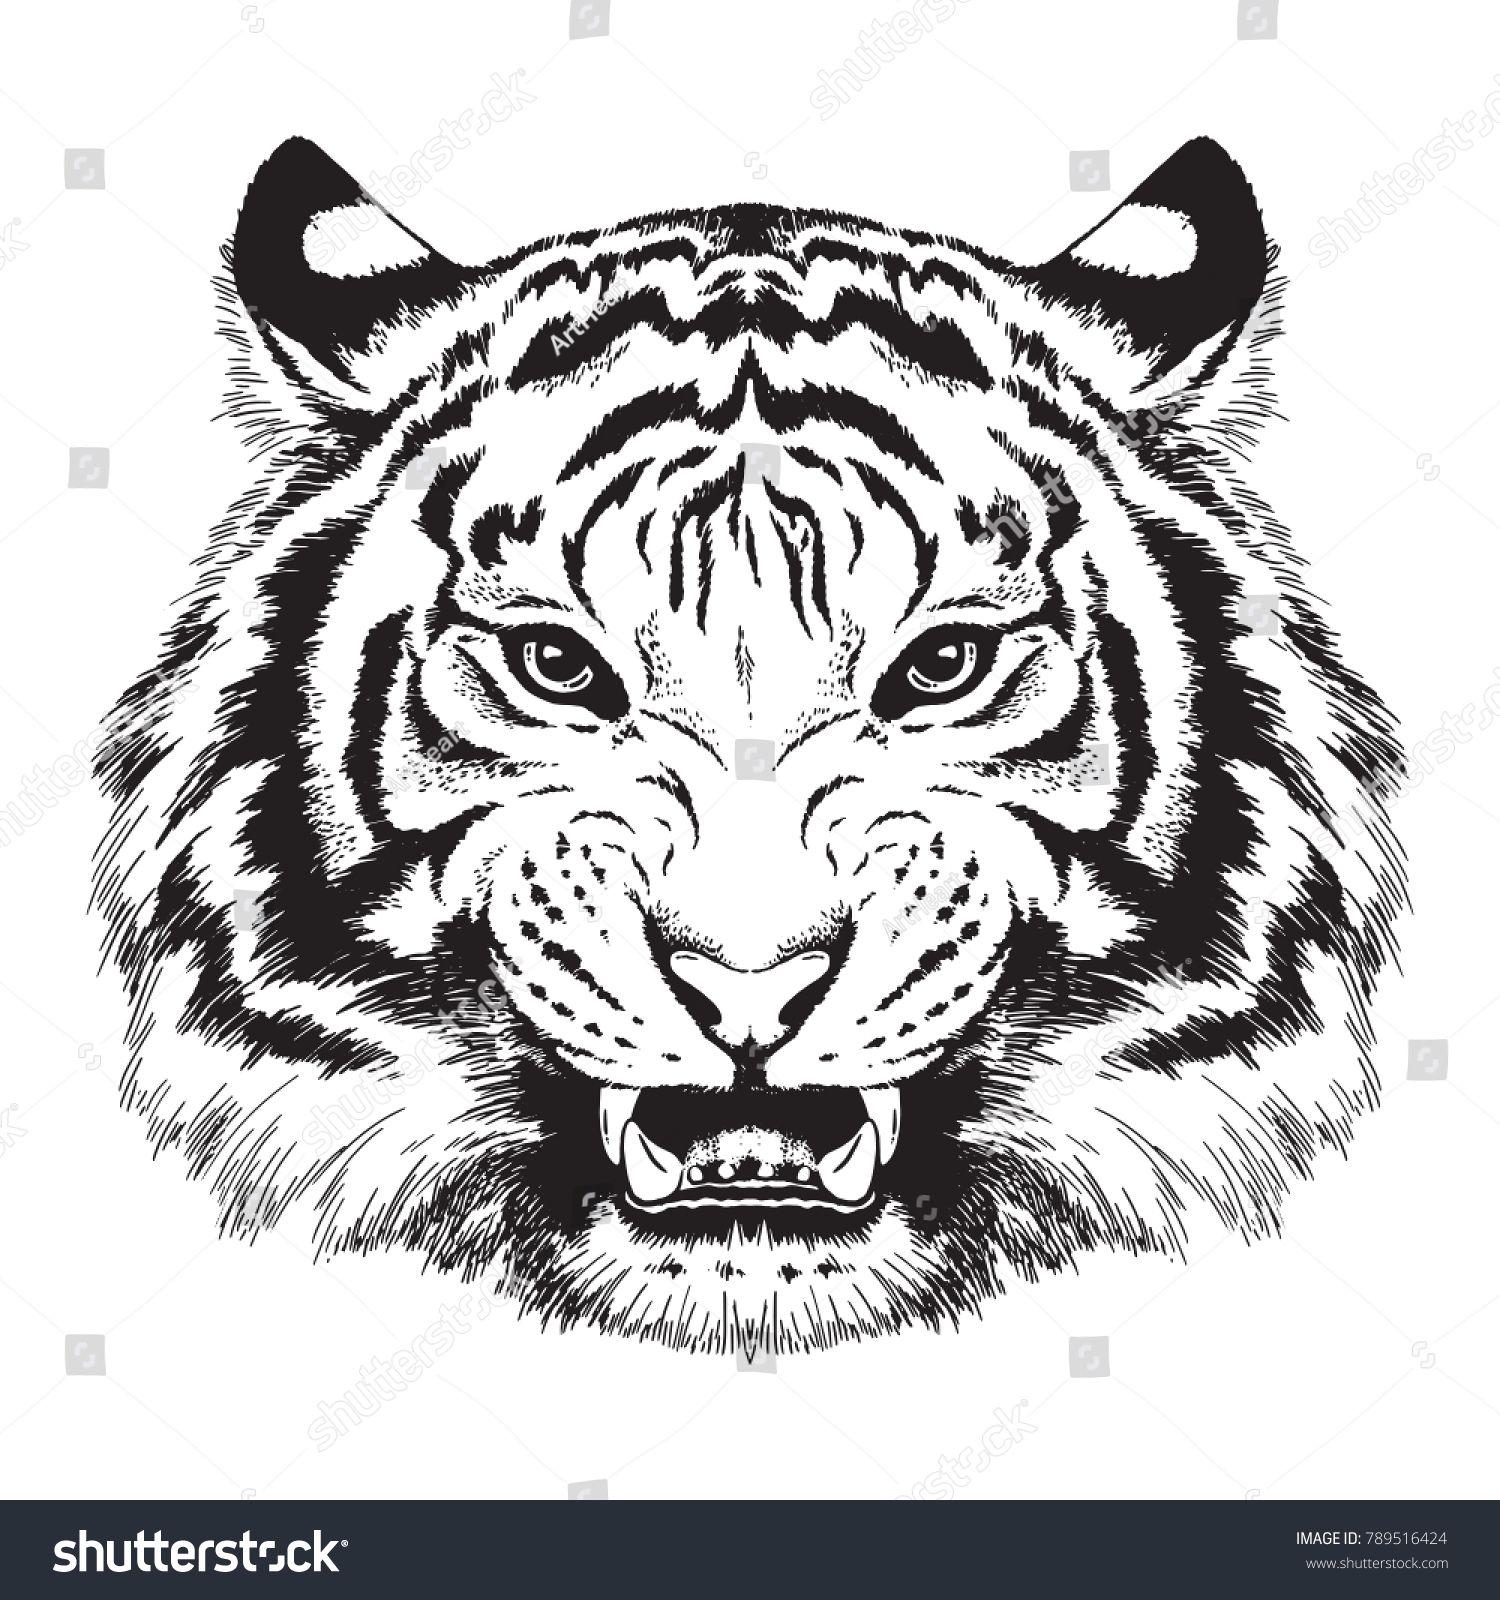 Tiger Euclidean Png Animal Big Cats Black Black And White Carnivoran Tiger Illustration Tiger Silhouette Lion Silhouette